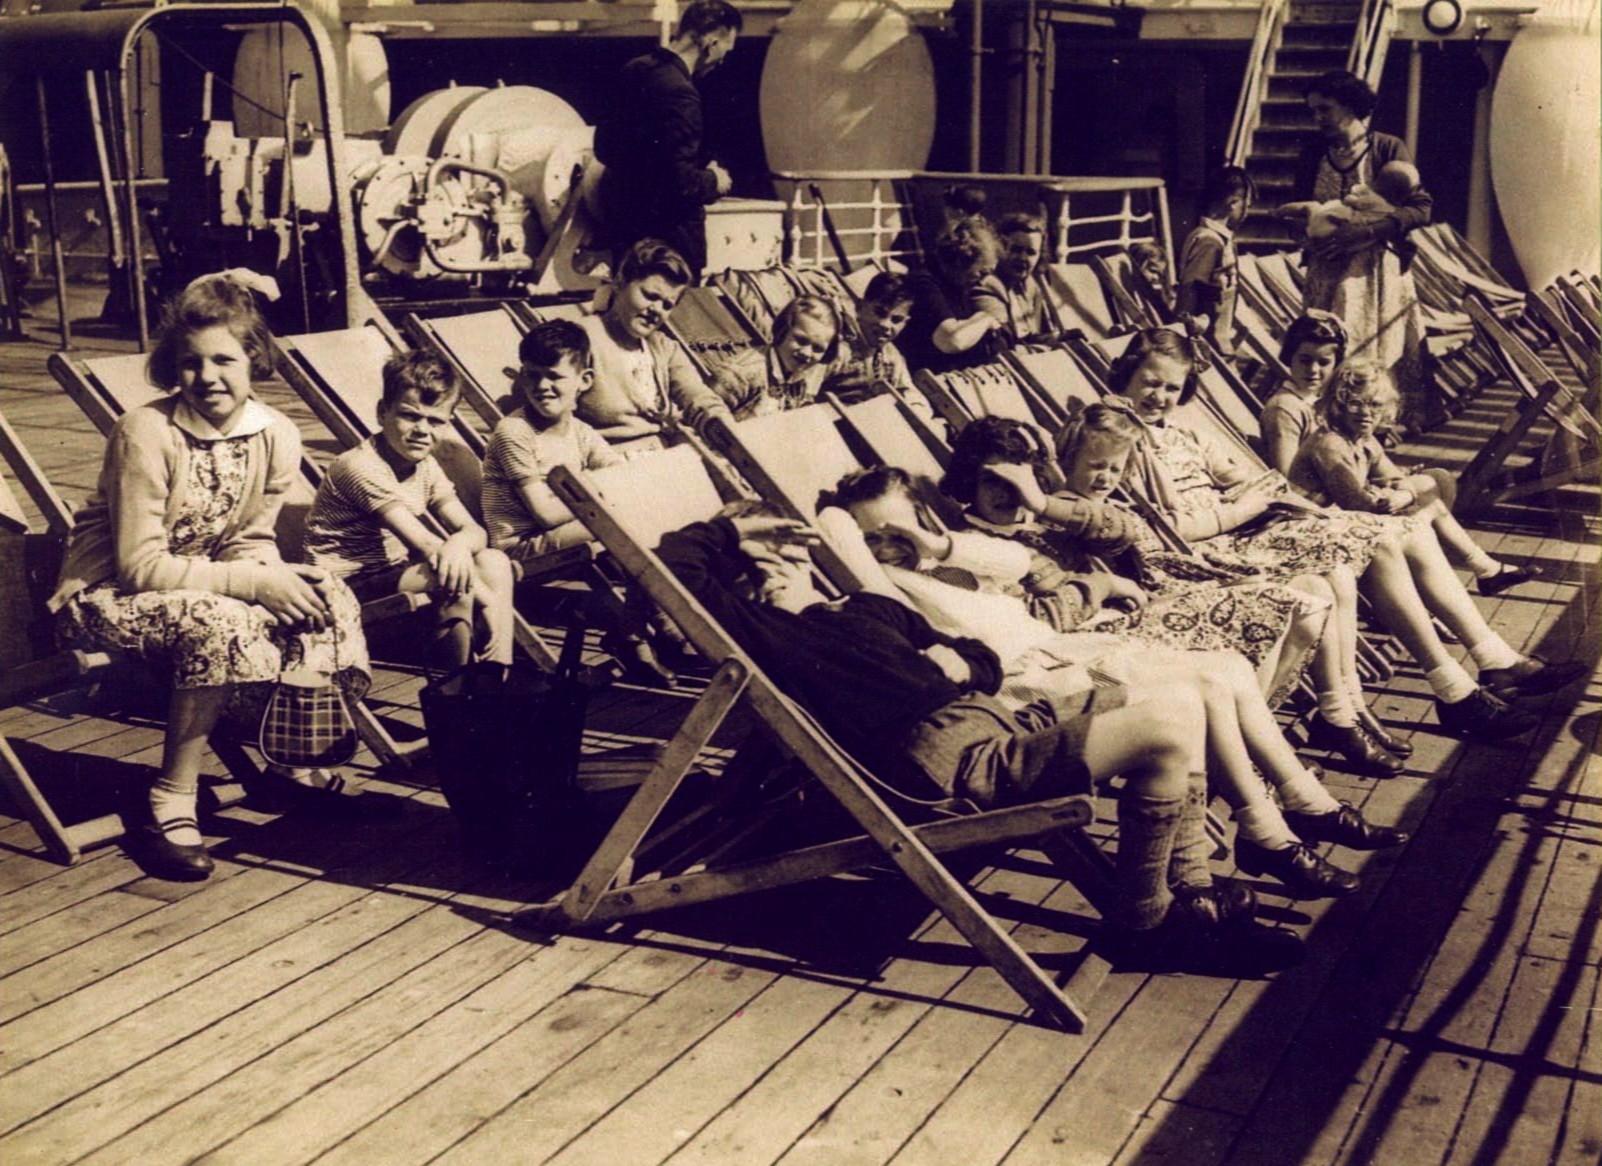 Onboard child migrants1.jpg